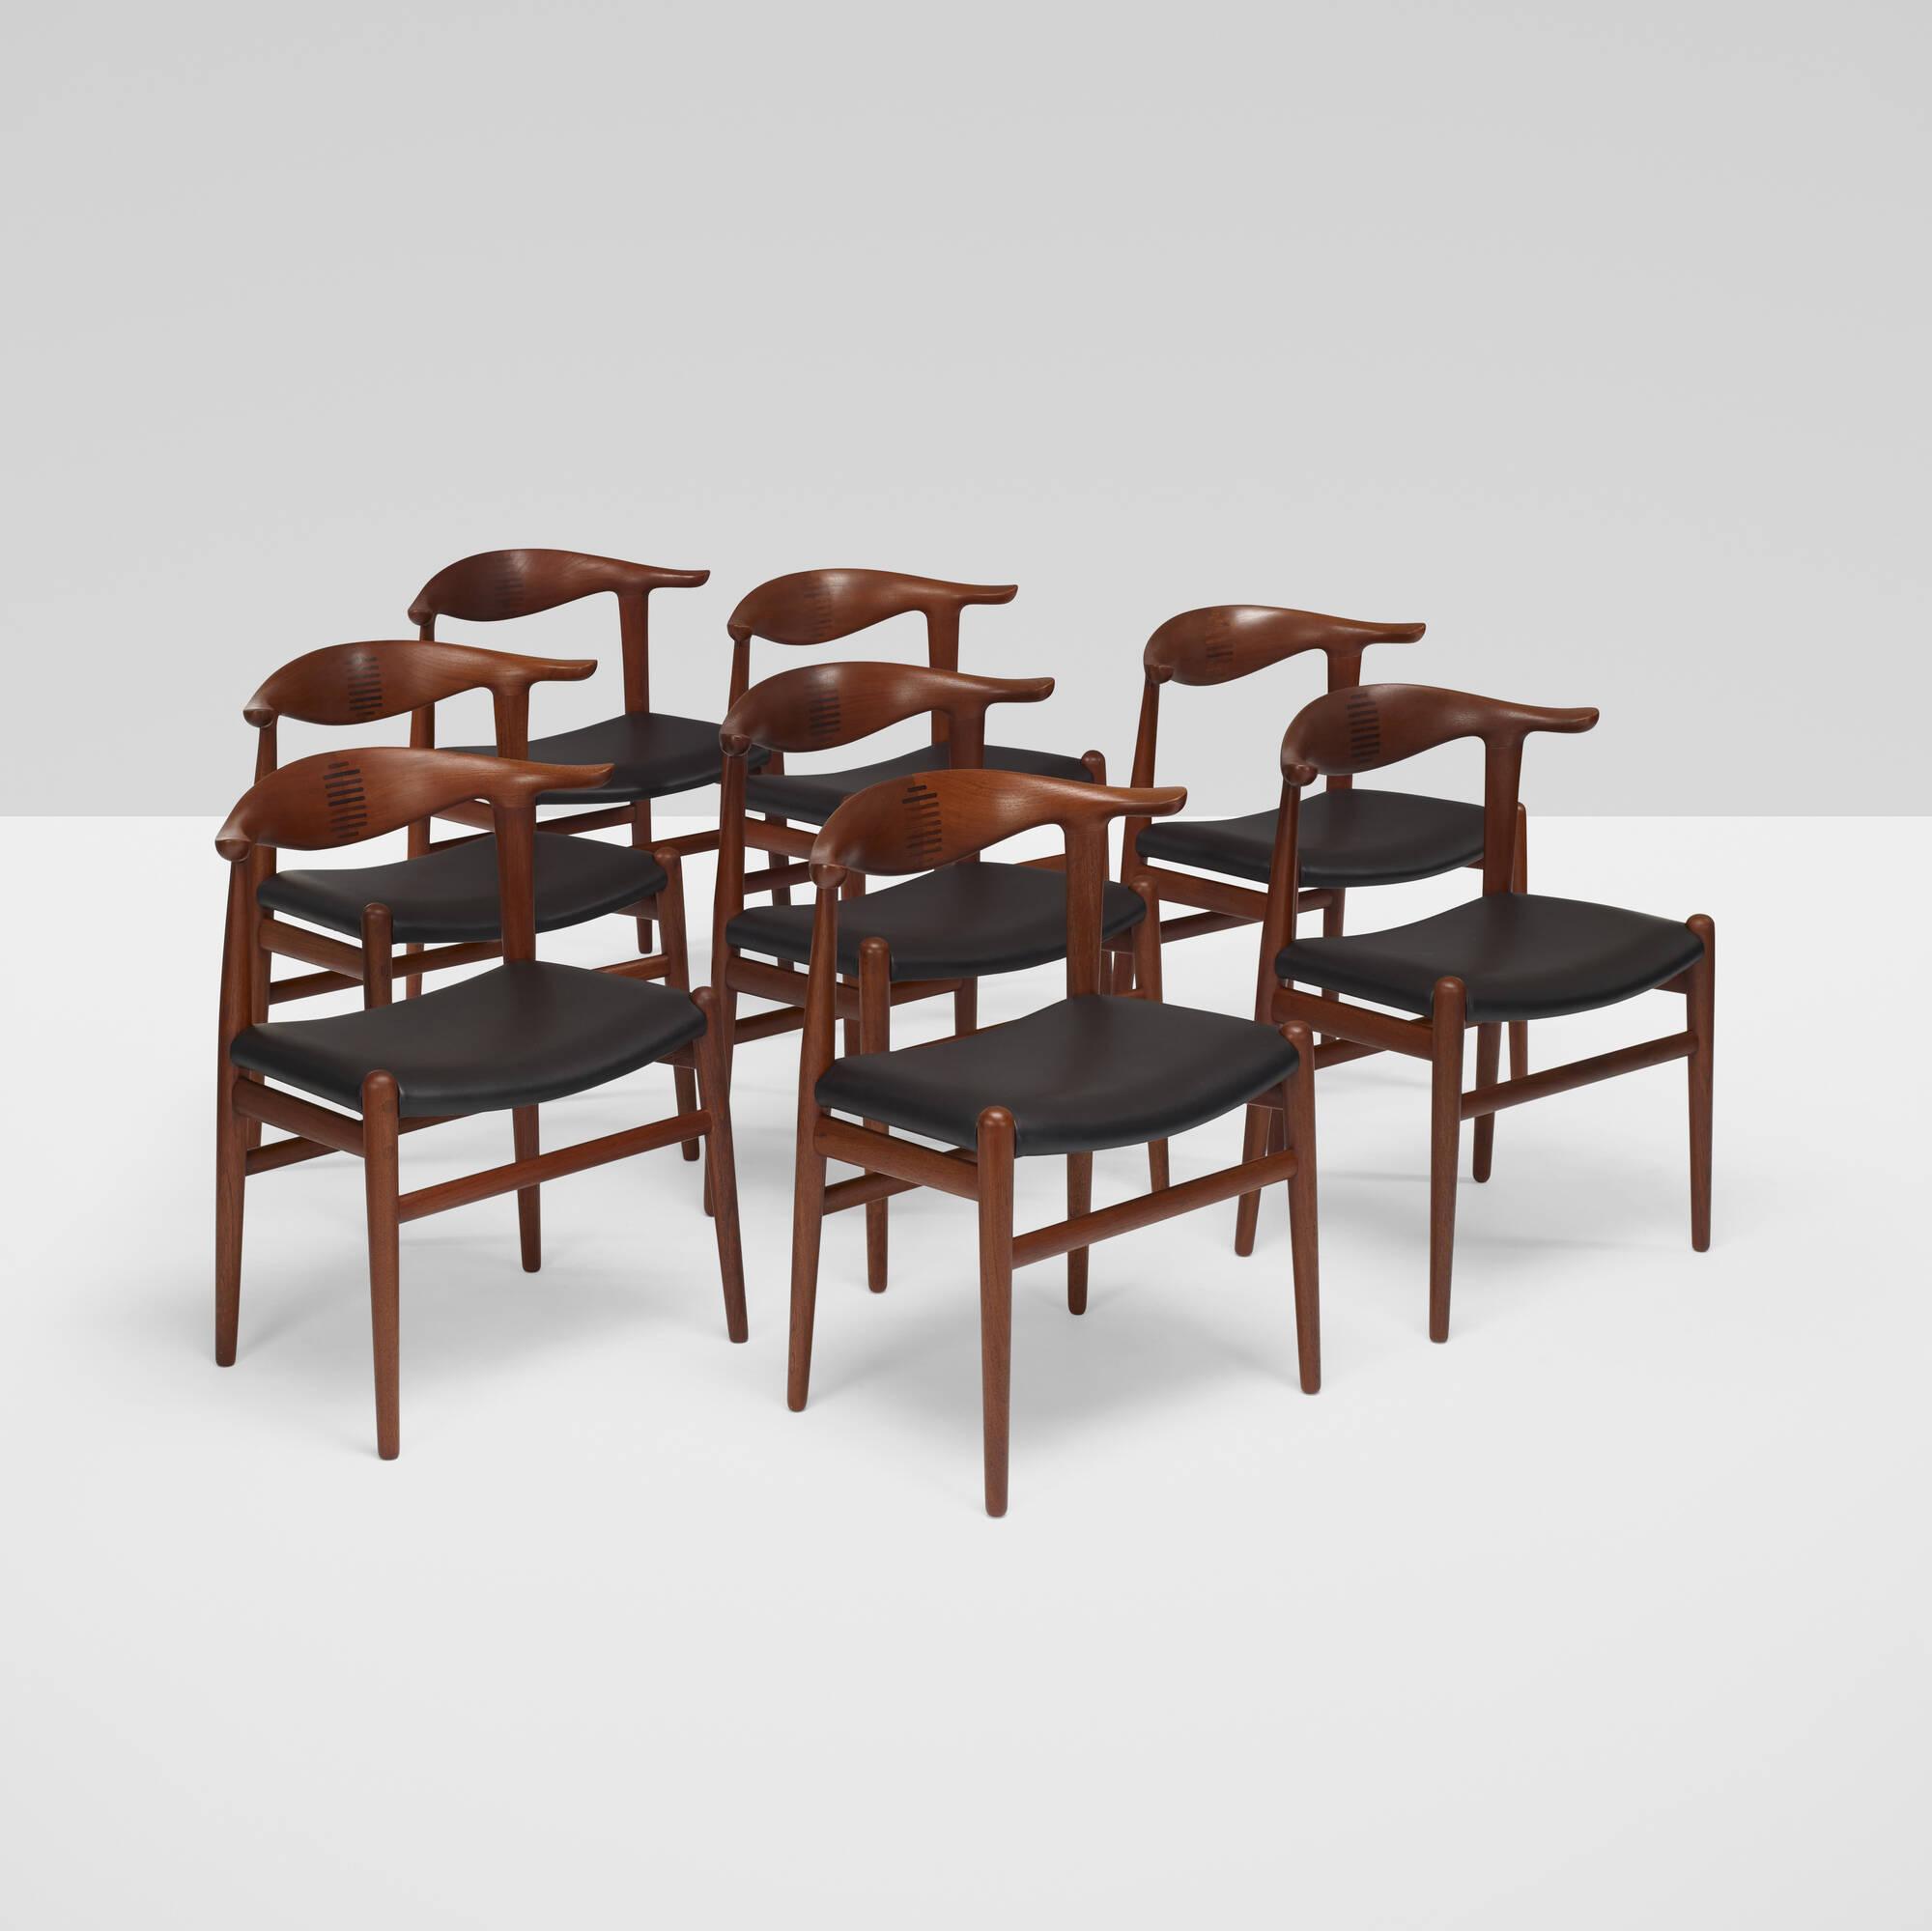 367: Hans J. Wegner / Cow Horn Chairs, Set Of Eight (1